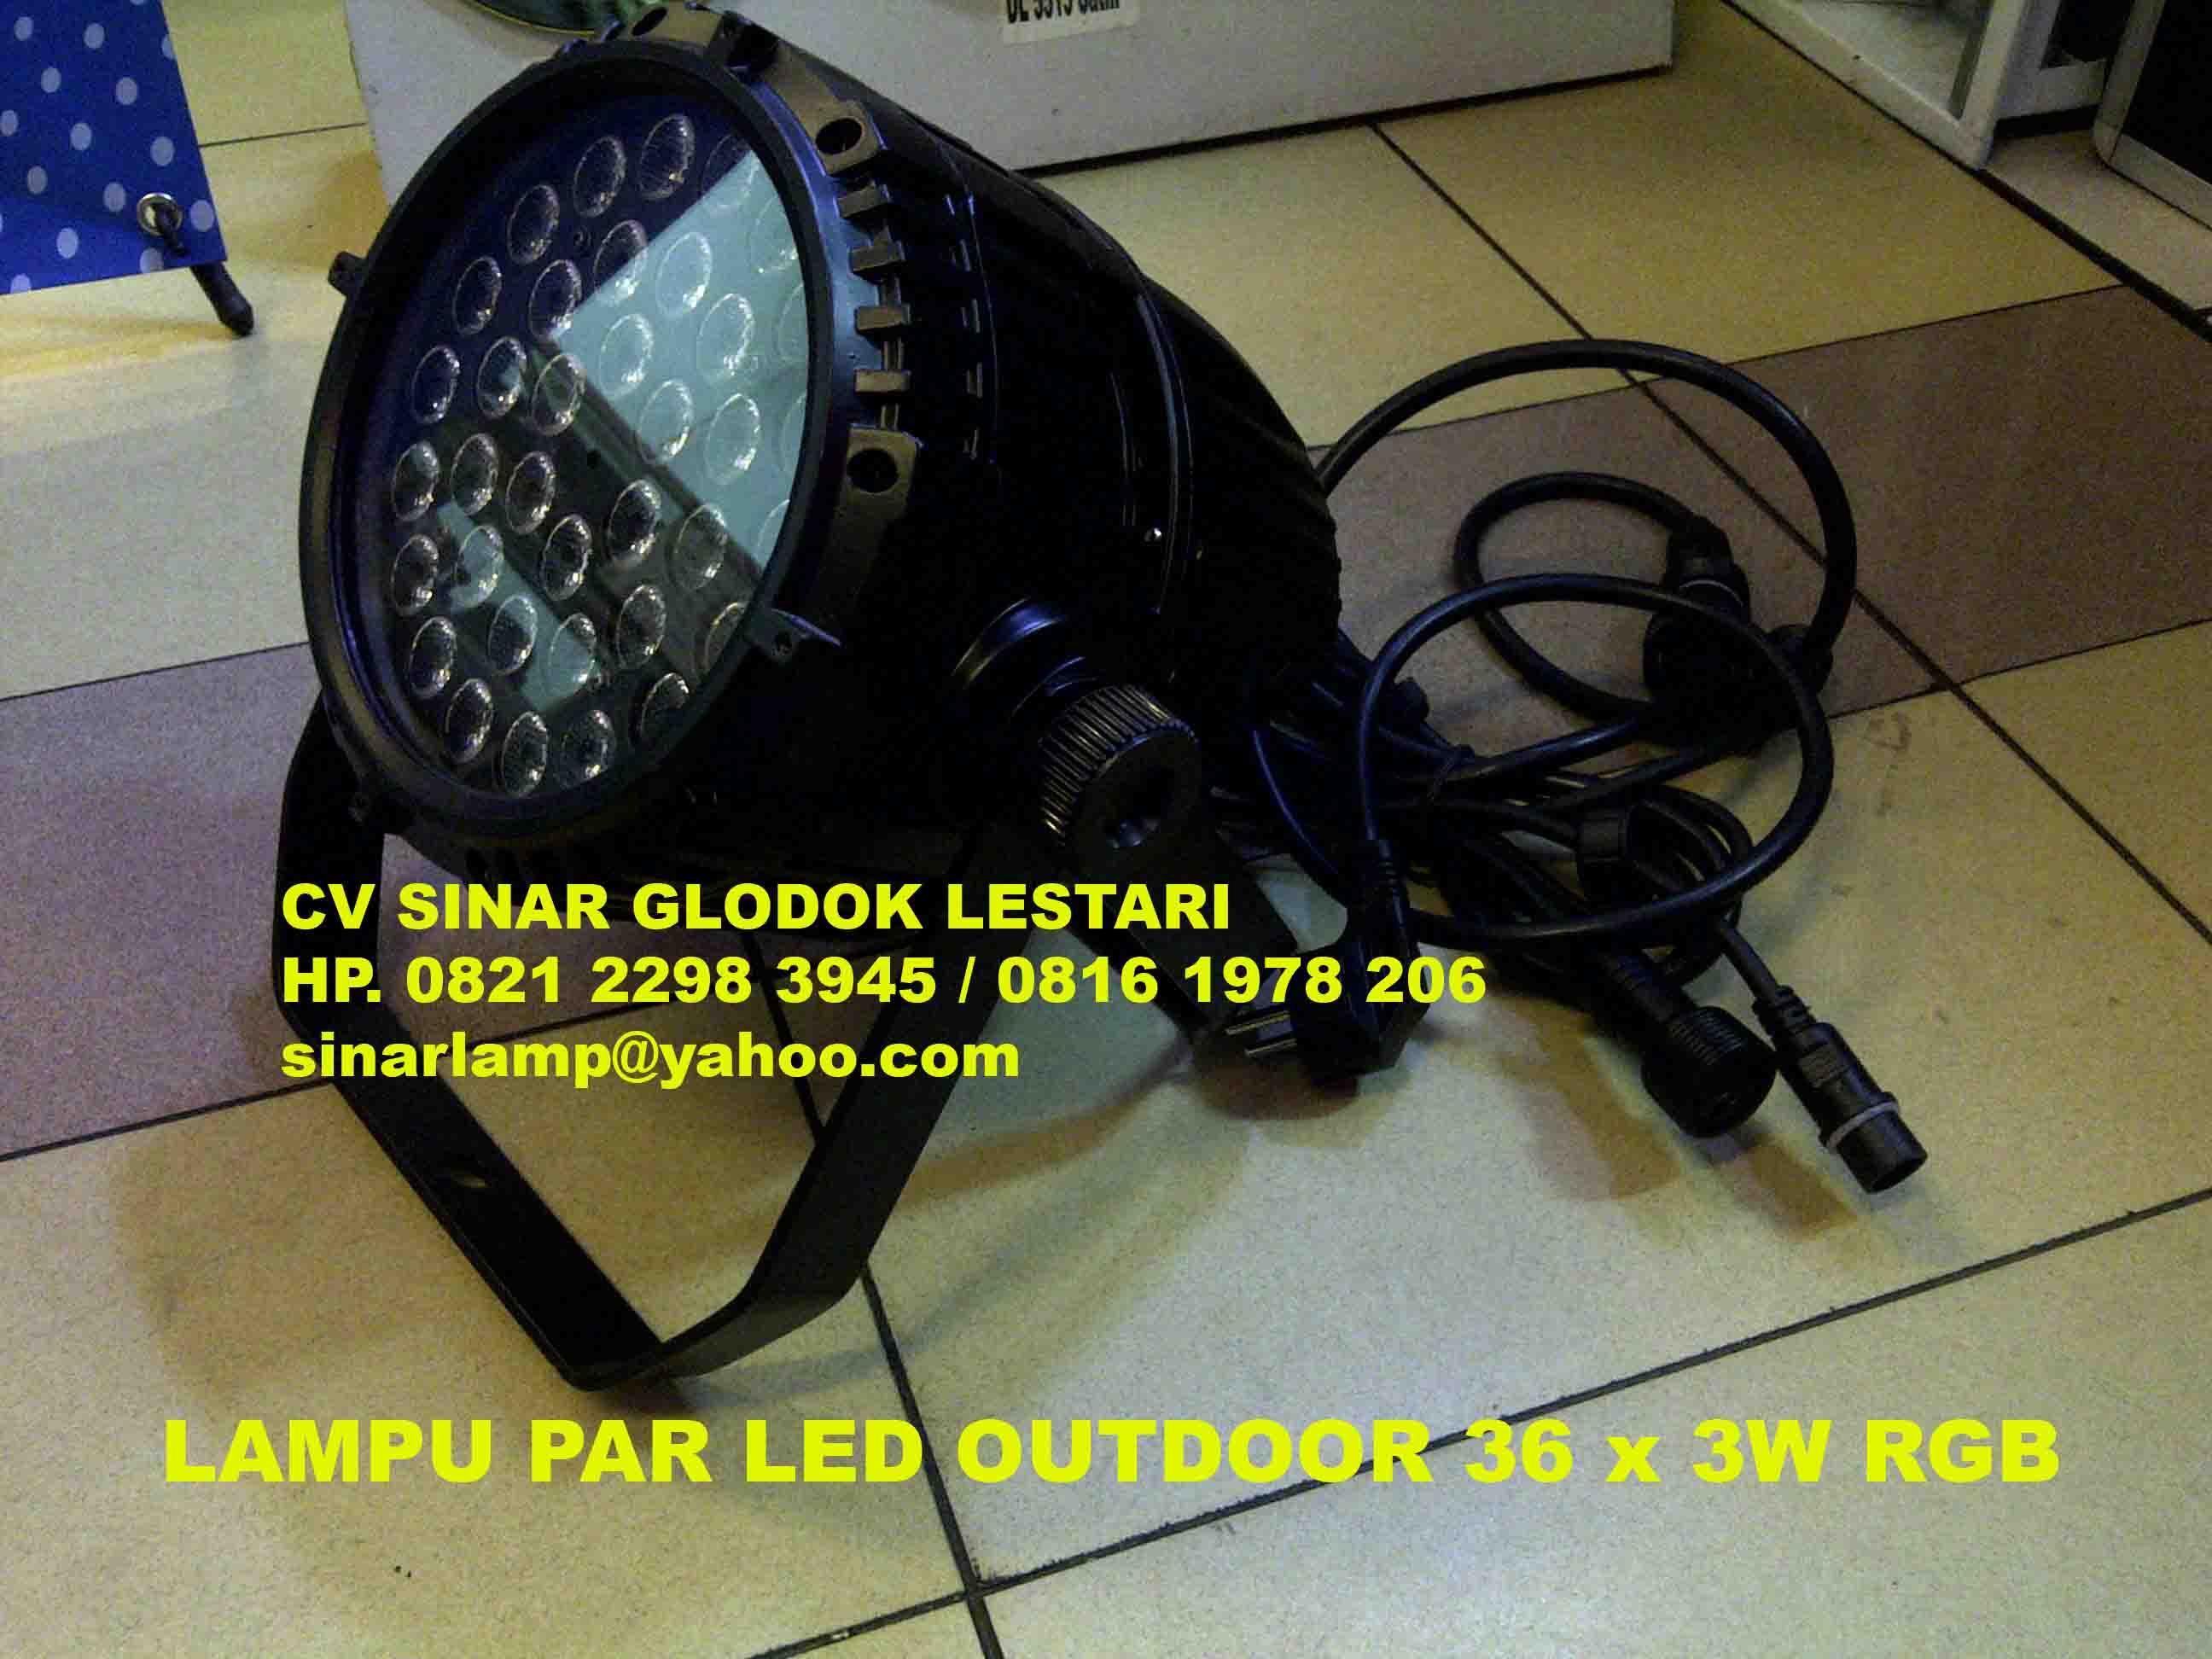 Lampu Sorot PAR LED 36 X 3W Outdoor